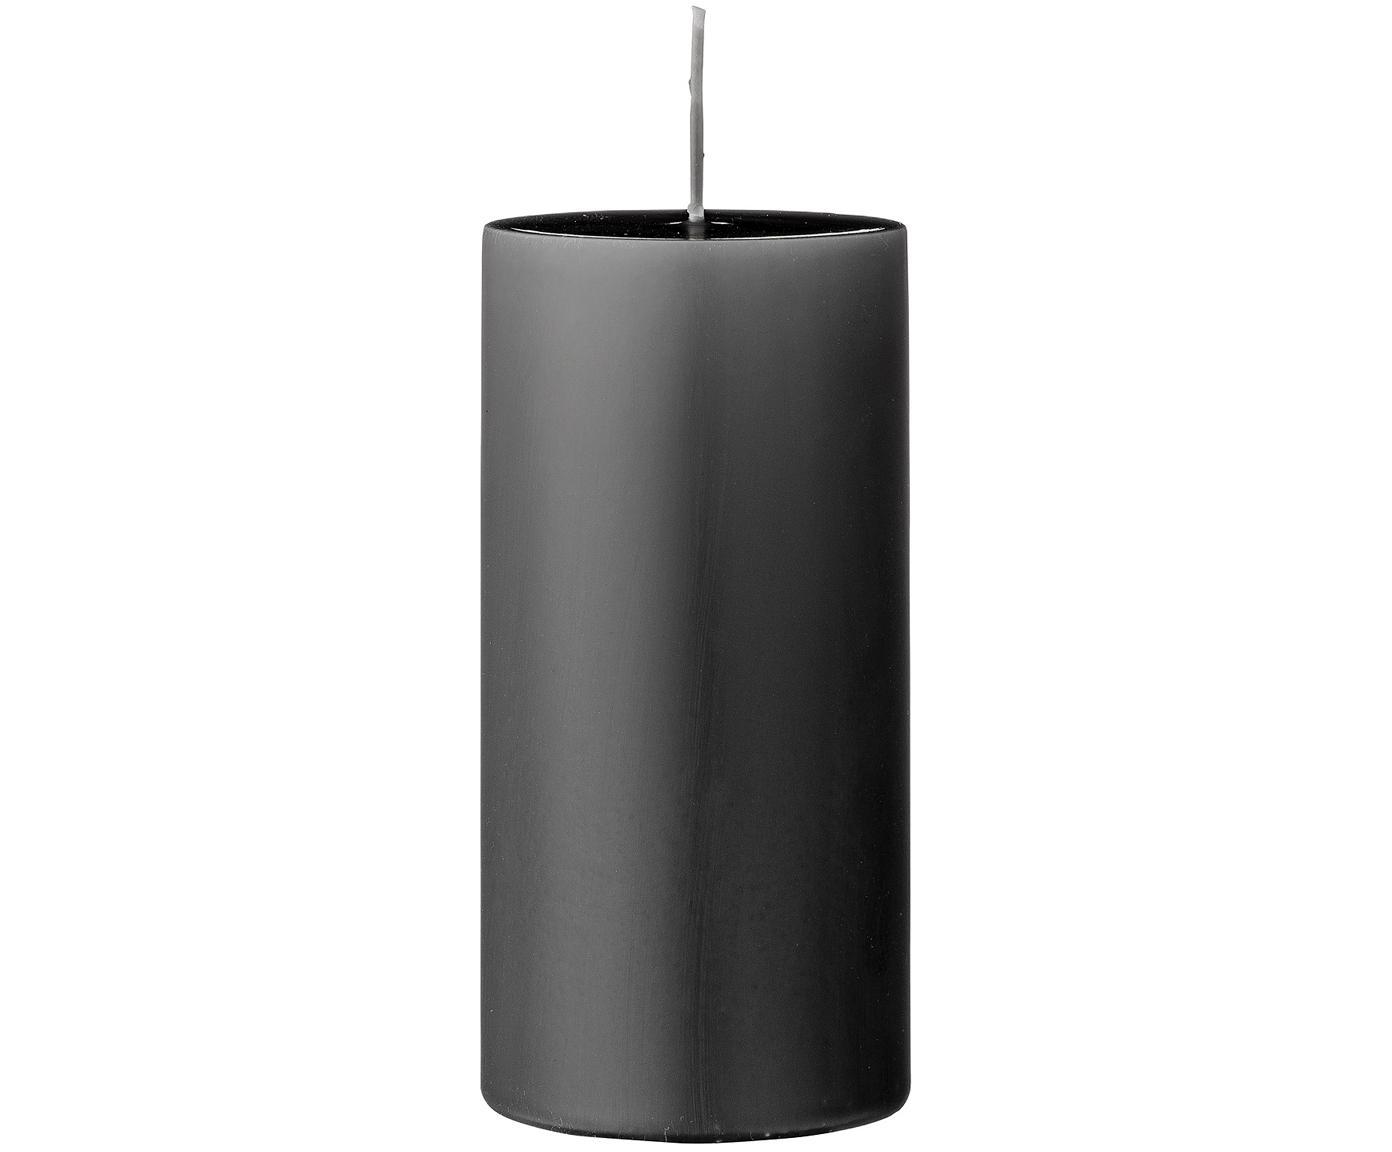 Candela pilastro Lulu 2 pz, Cera, Grigio, Ø 7 x Alt. 15 cm